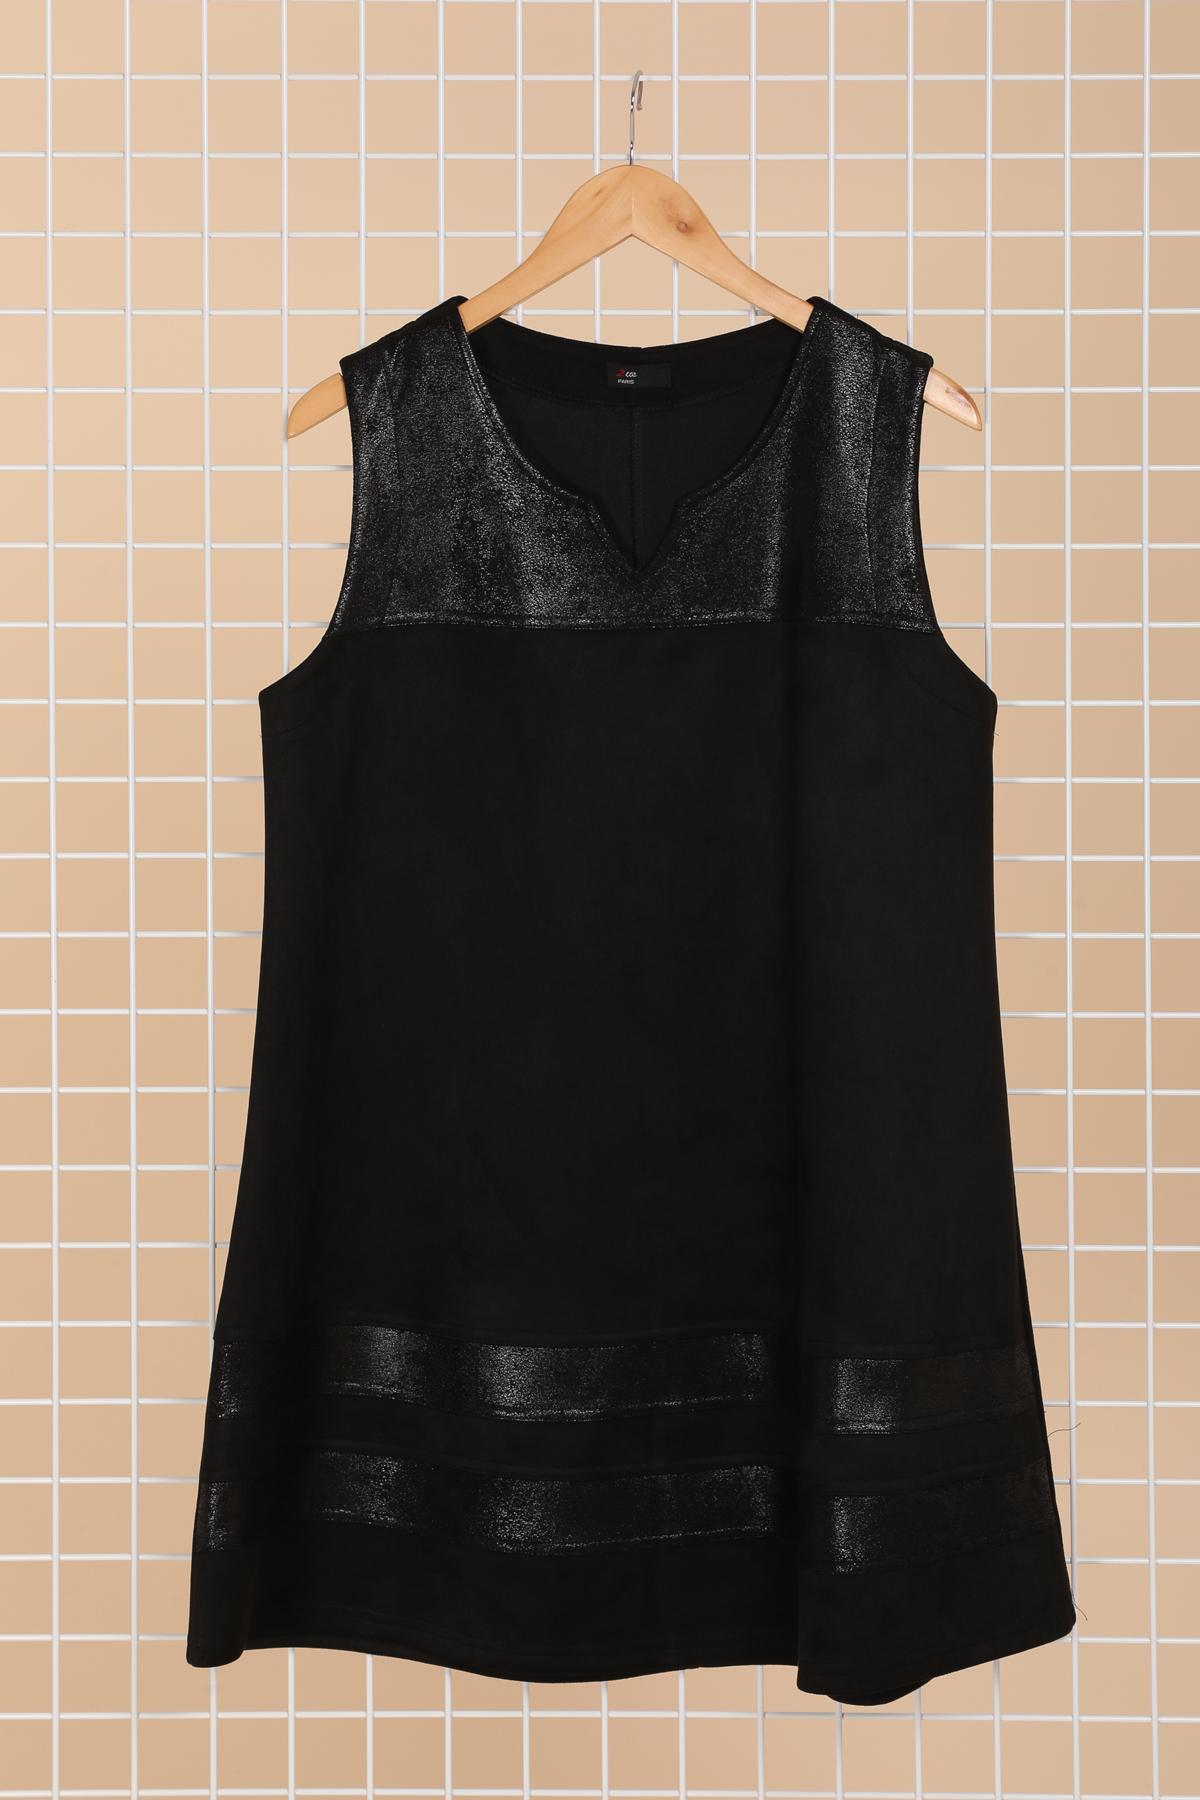 robe noire grande taille 2w noir r1367